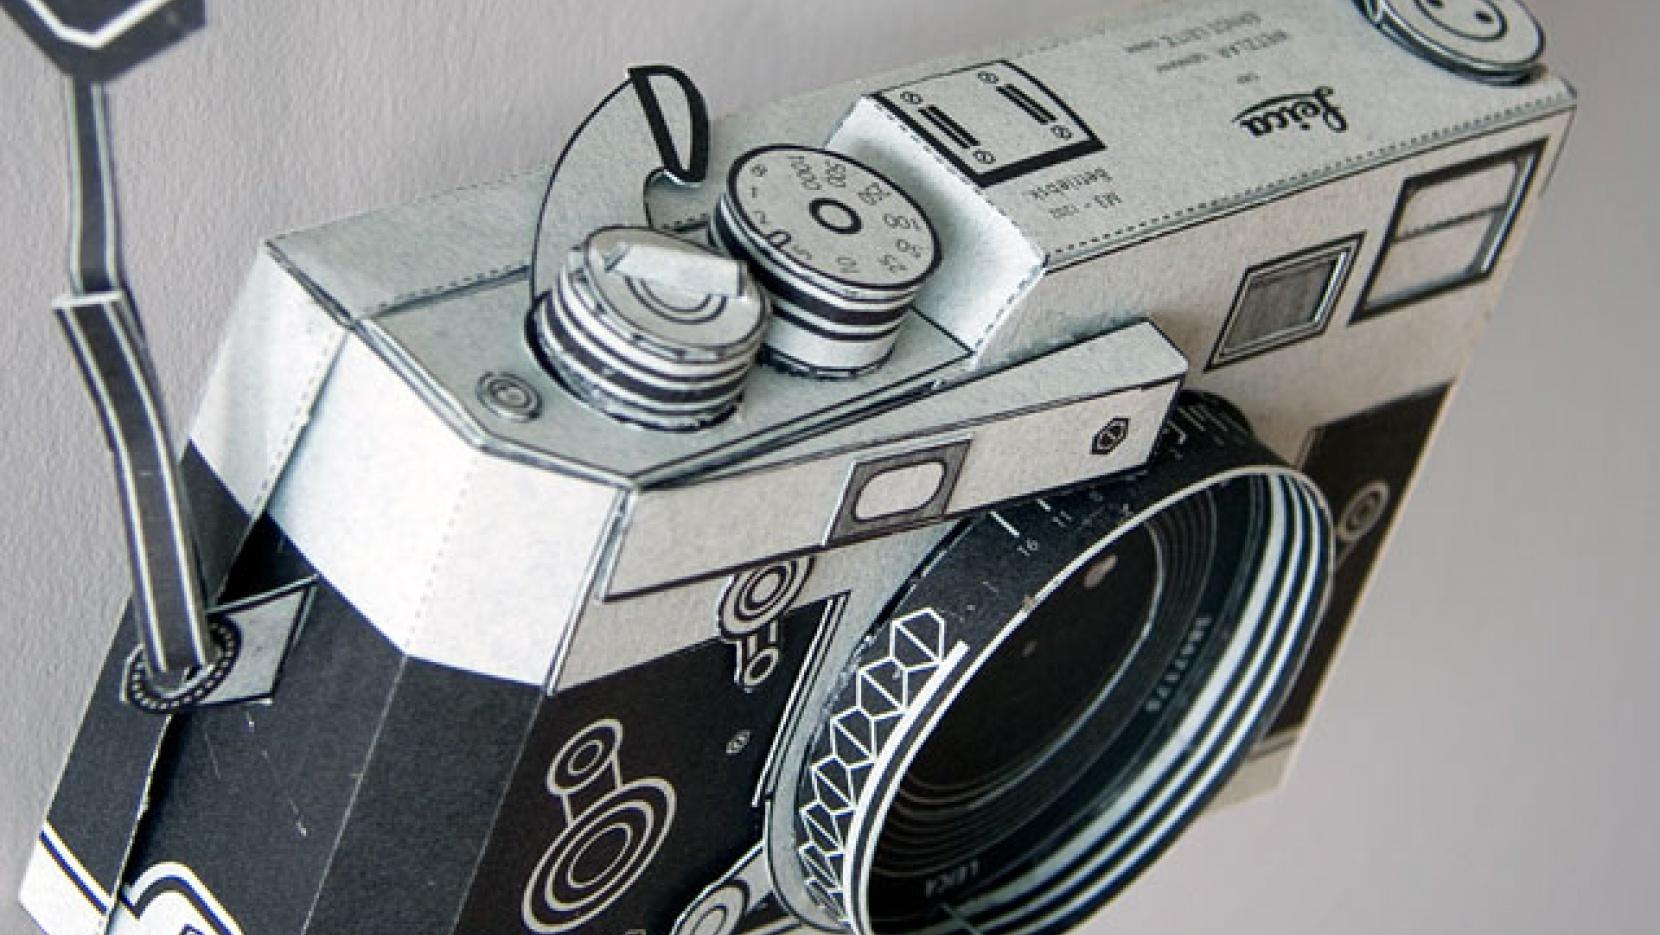 photo about Printable Camera referred to as Printable Lie-ca M3 digicam through Matthew Nicholson Yatzer